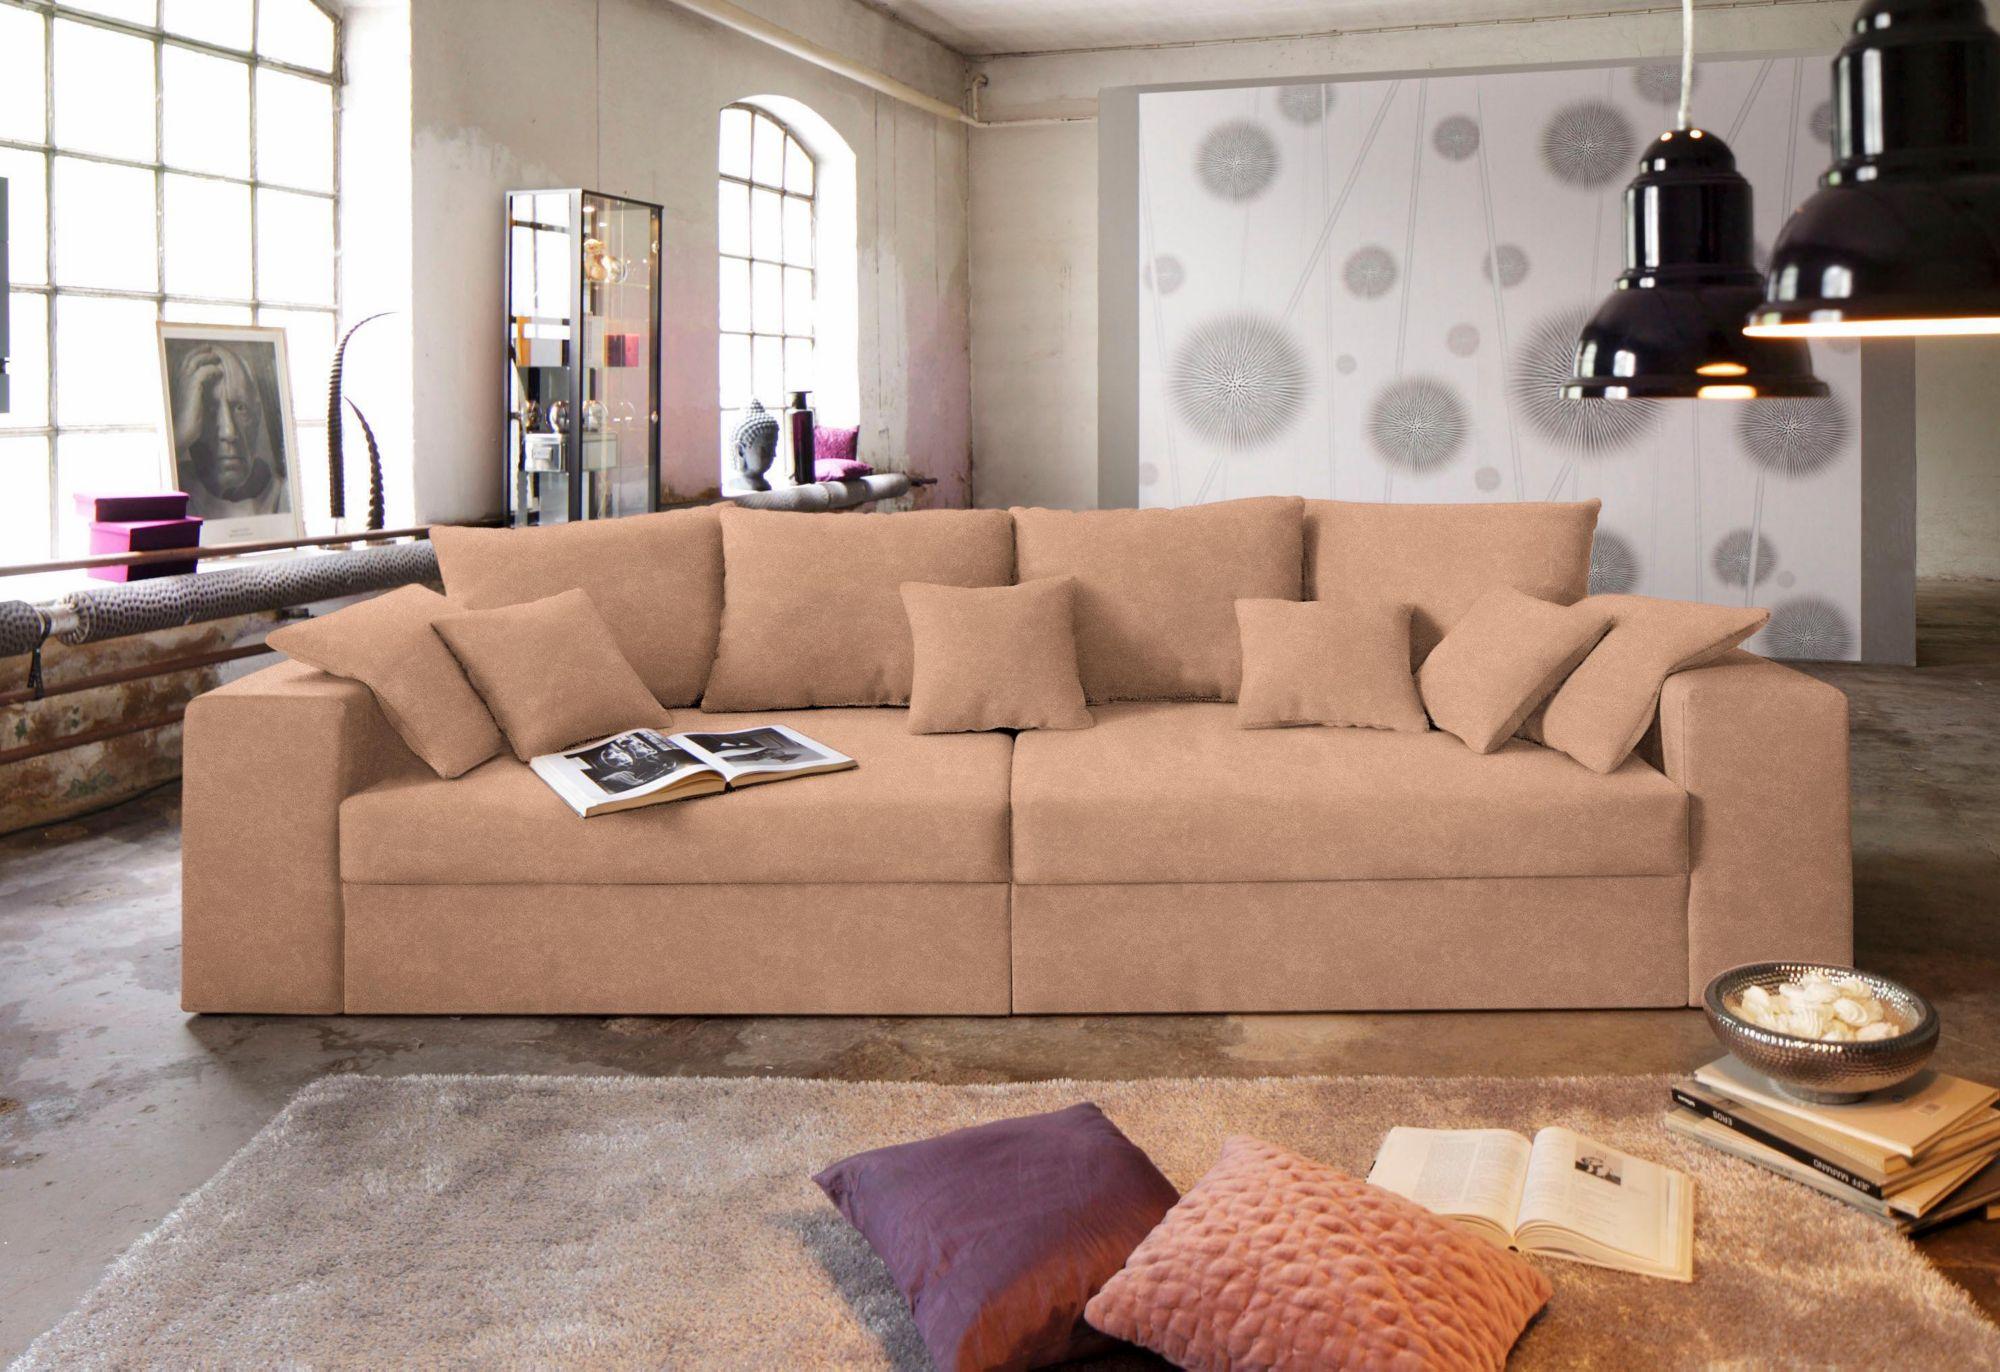 big sofa wahlweise in xl oder xxl schwab versand big sofas. Black Bedroom Furniture Sets. Home Design Ideas